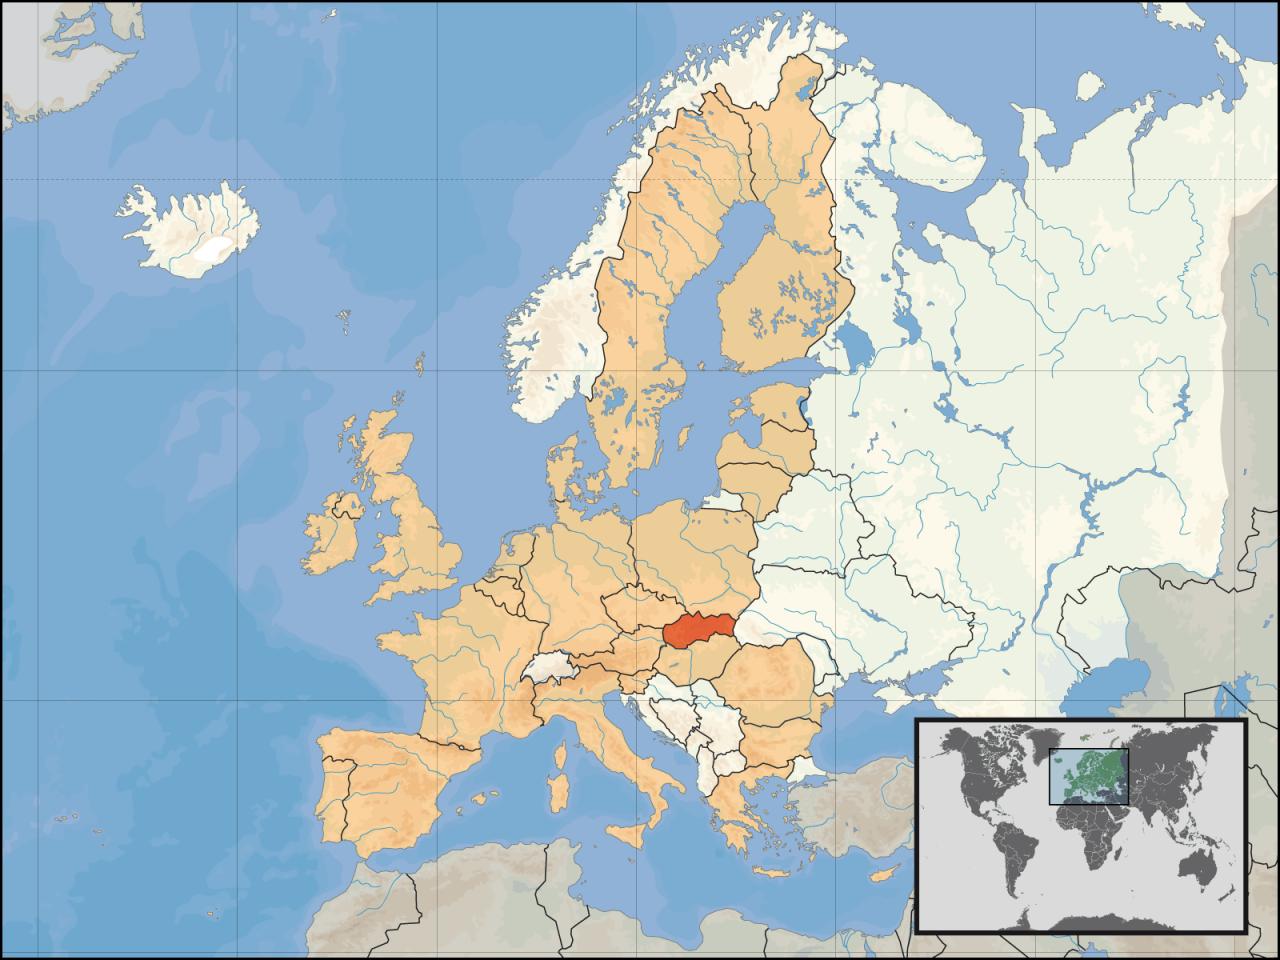 Lokalizacja Słowacji na tle Europy